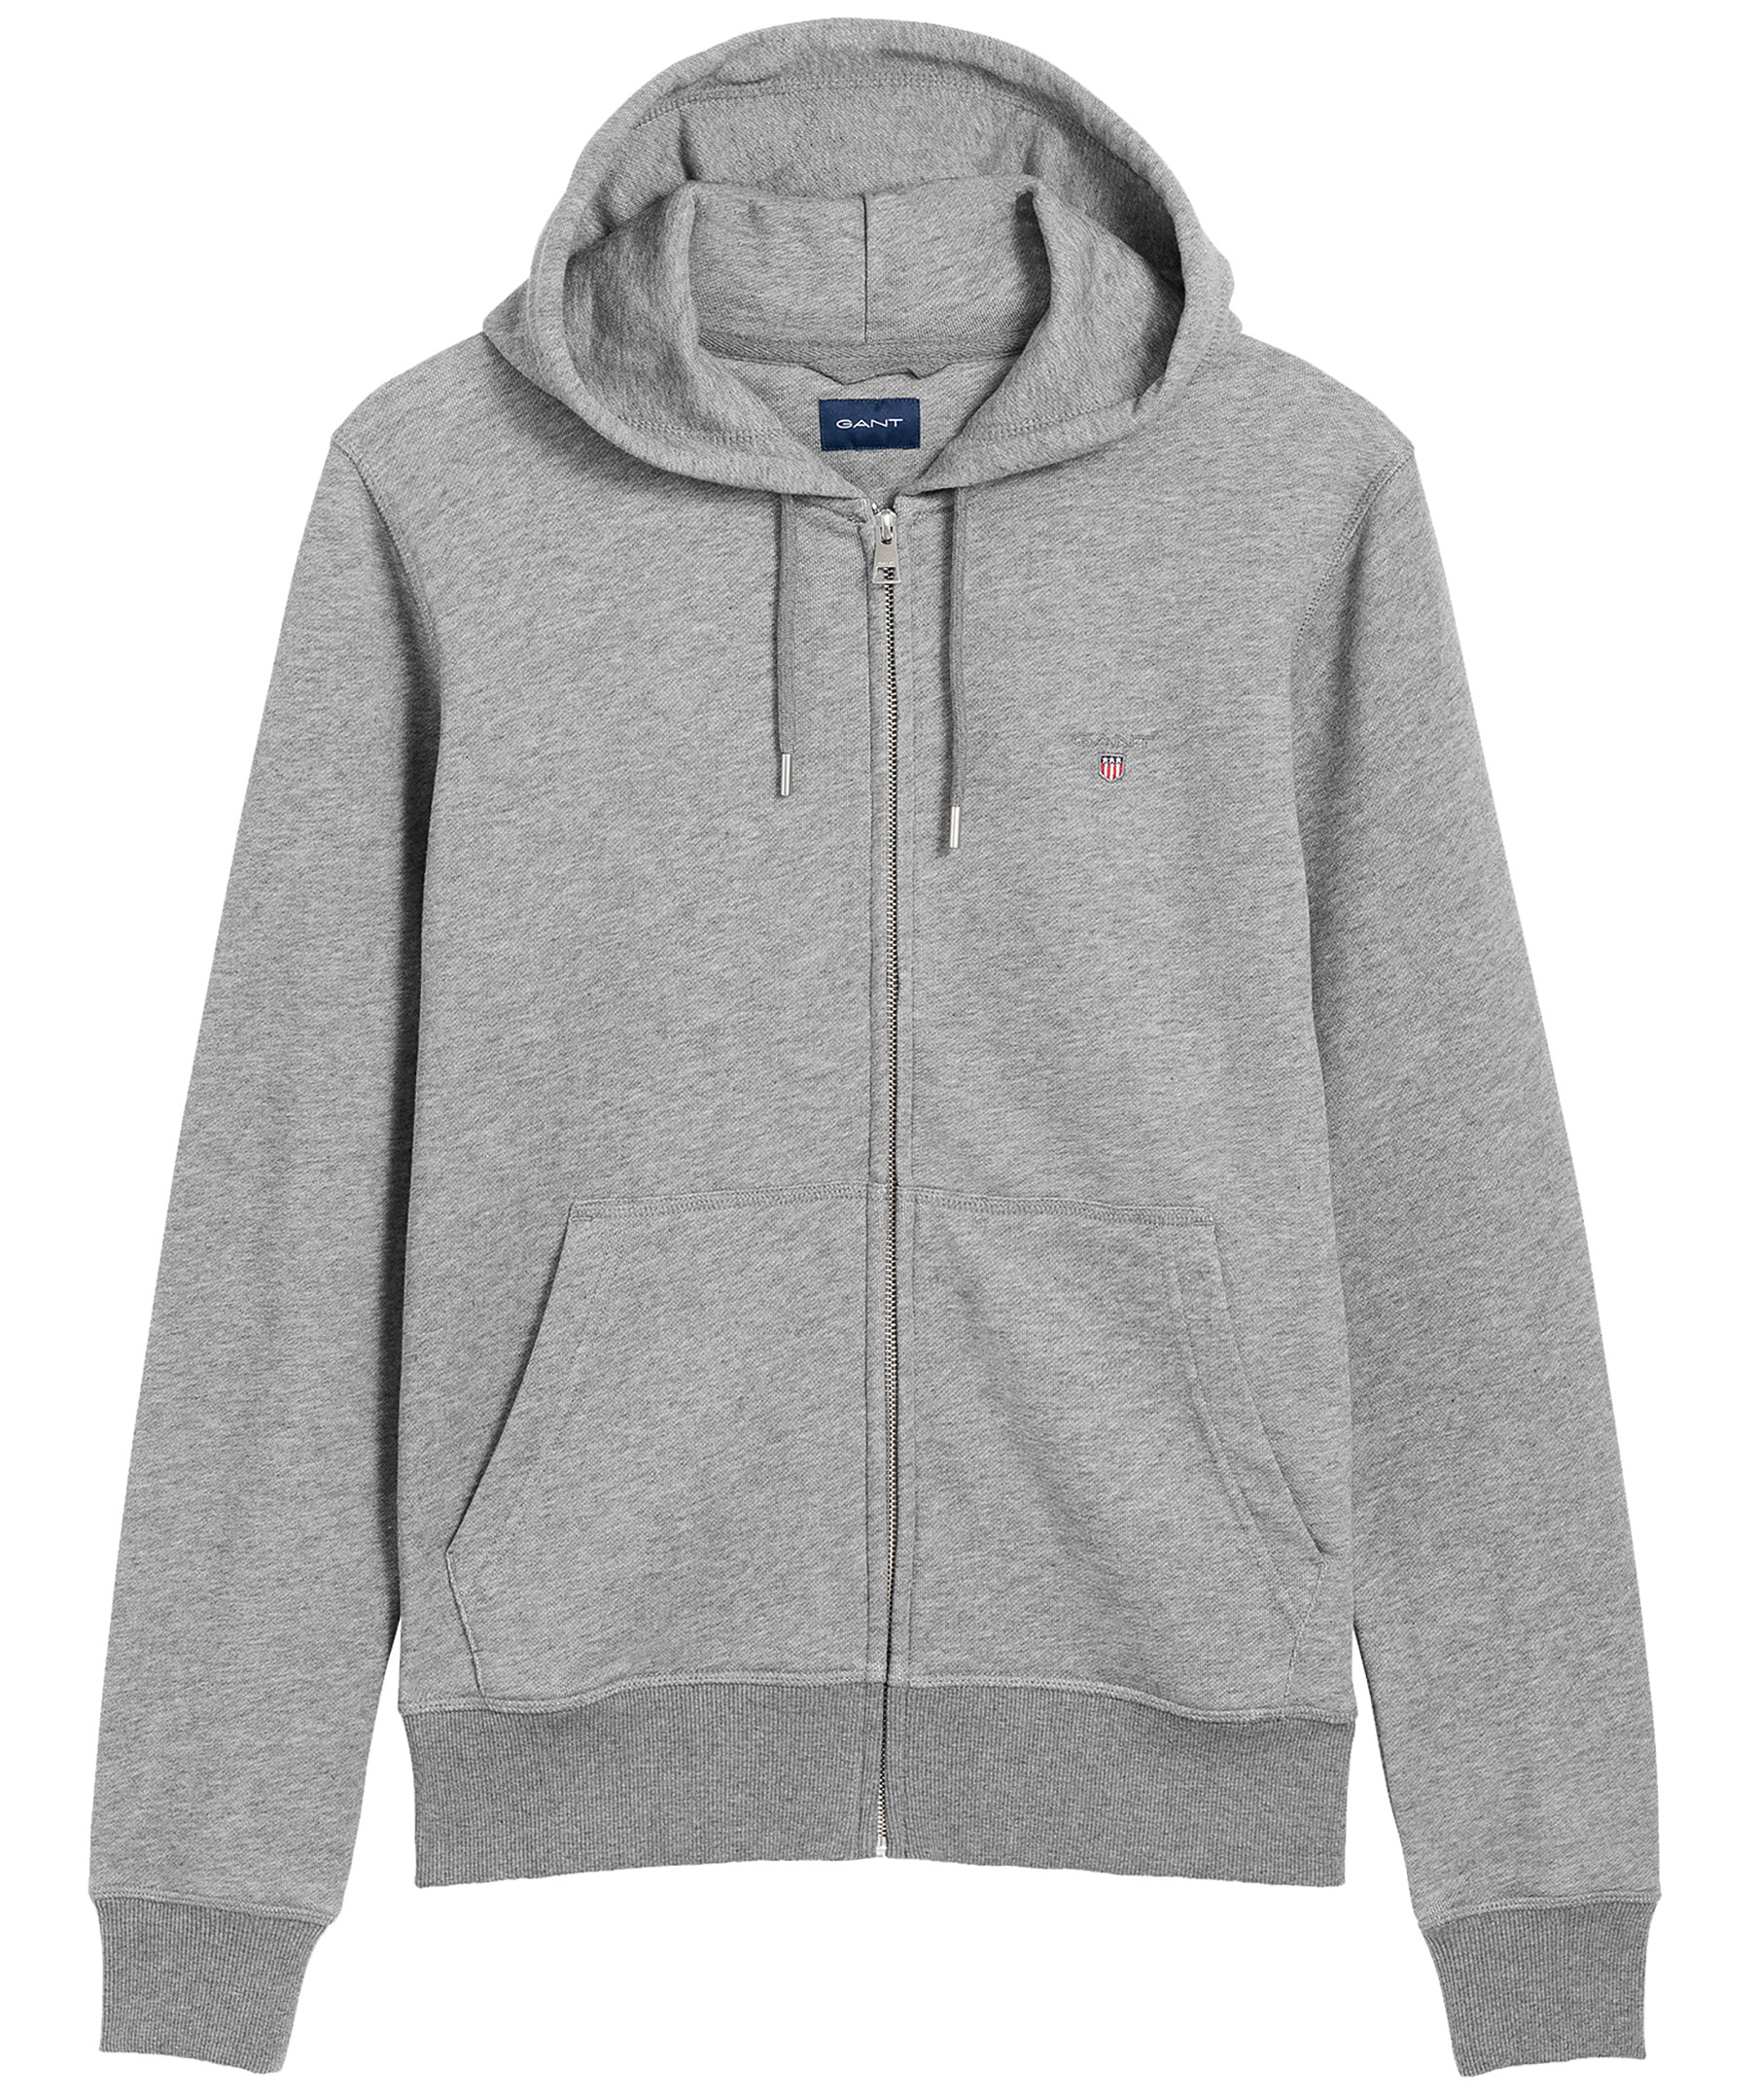 Toppkvalité officiell butik gratis frakt Handla Gant Original full zip hoodie hos Johnells.se